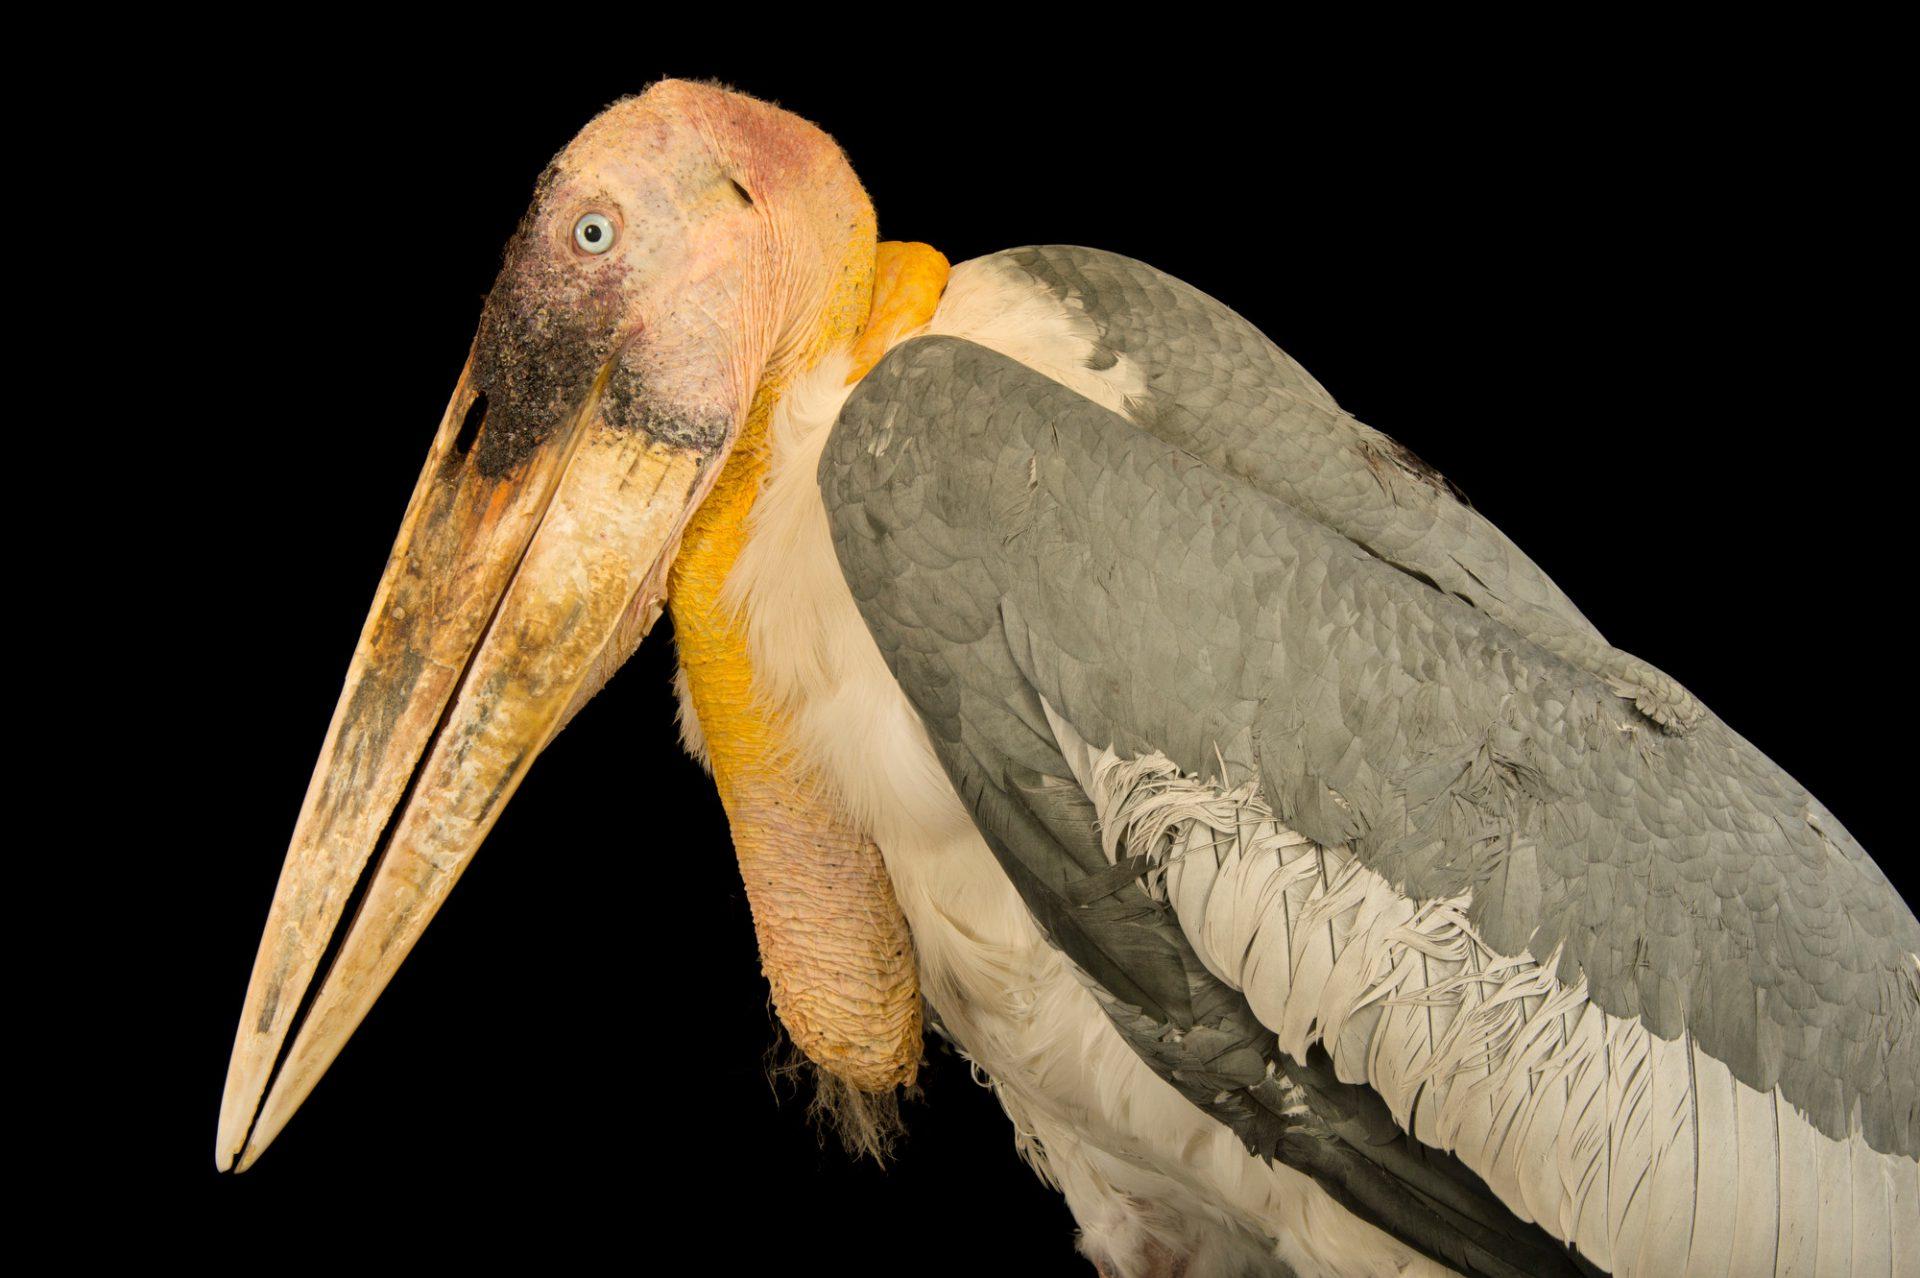 Photo: An endangered greater adjutant stork (Leptoptilos dubius) at Kamla Nehru Zoological Garden, Ahmedabad, India.